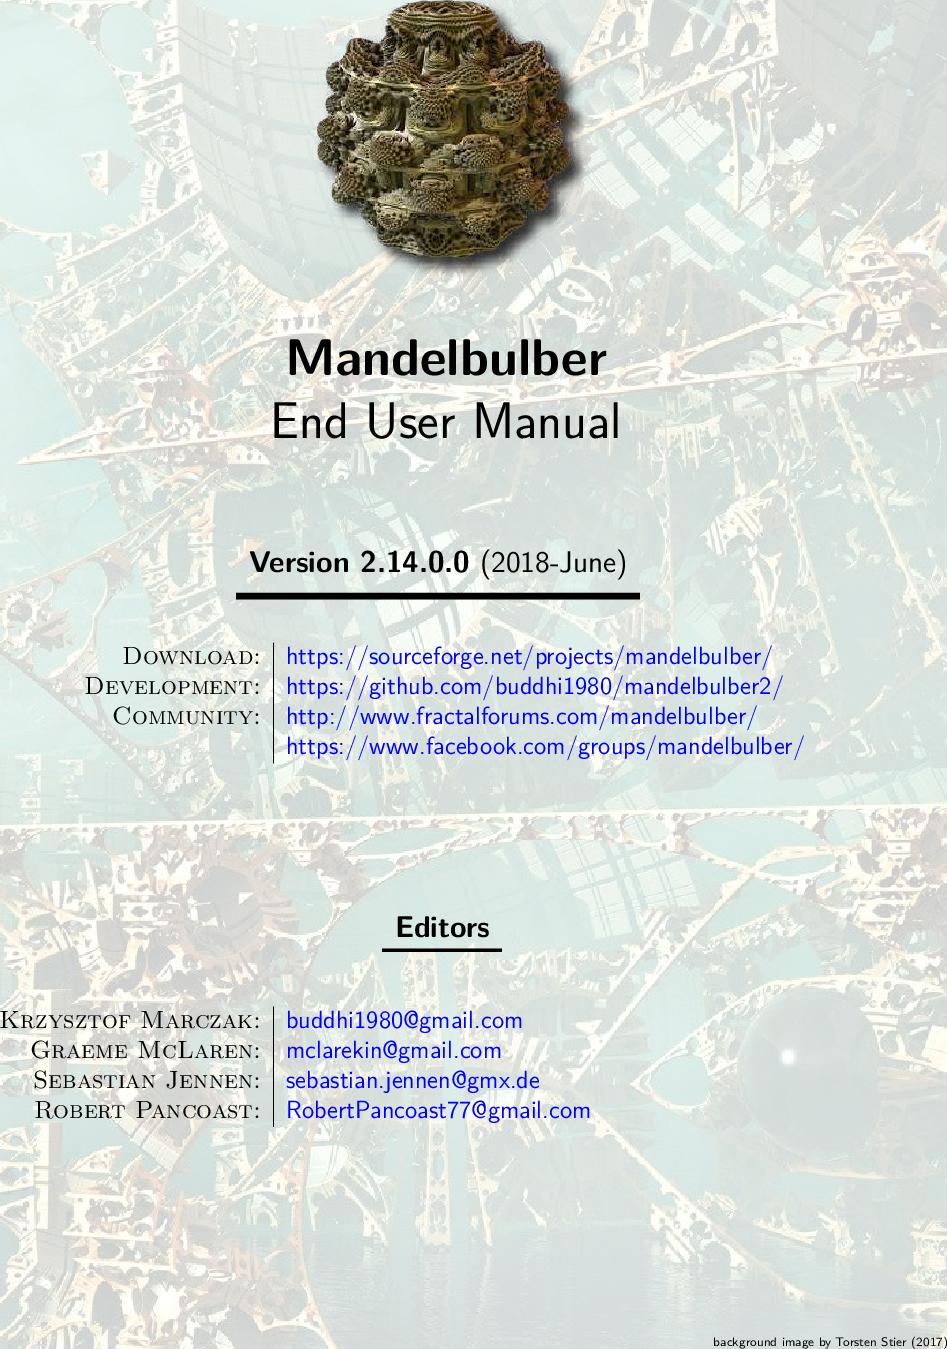 Mandelbulber Manual